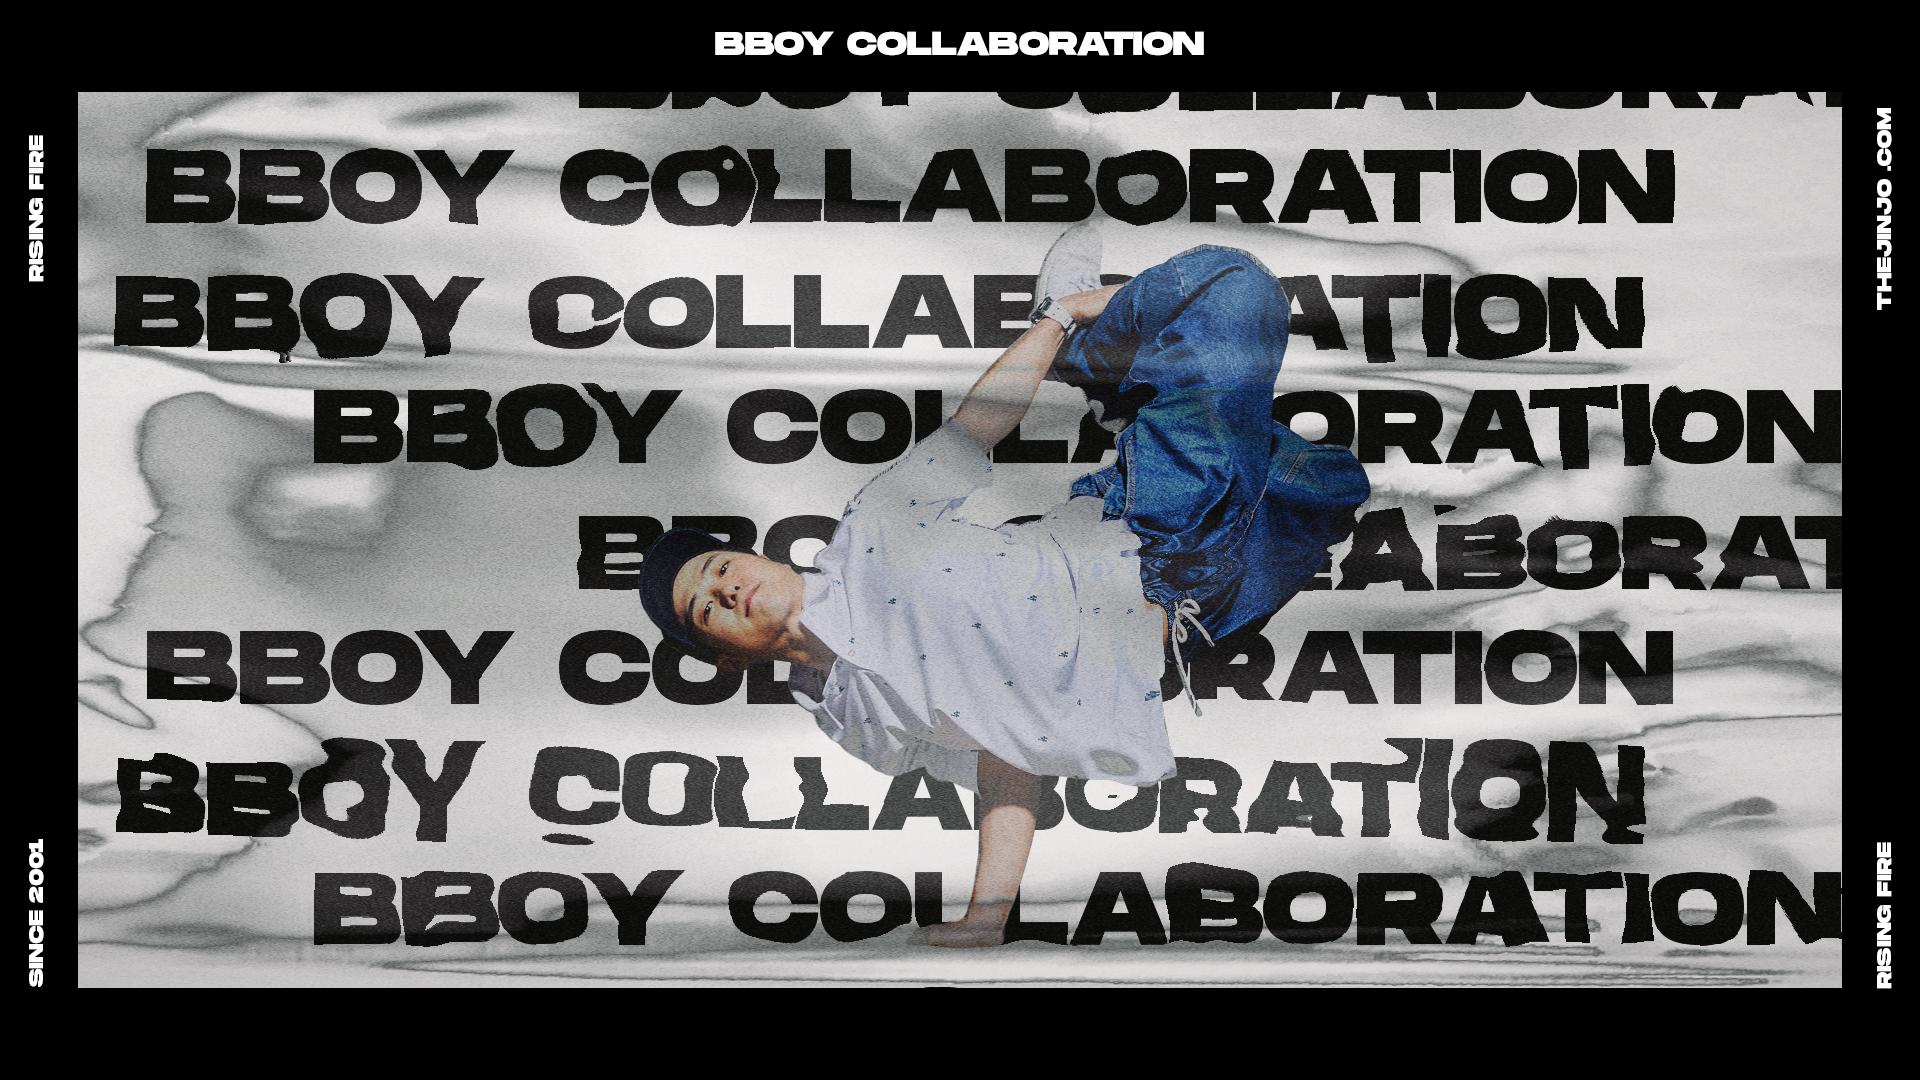 BBOY X COLLABORATION